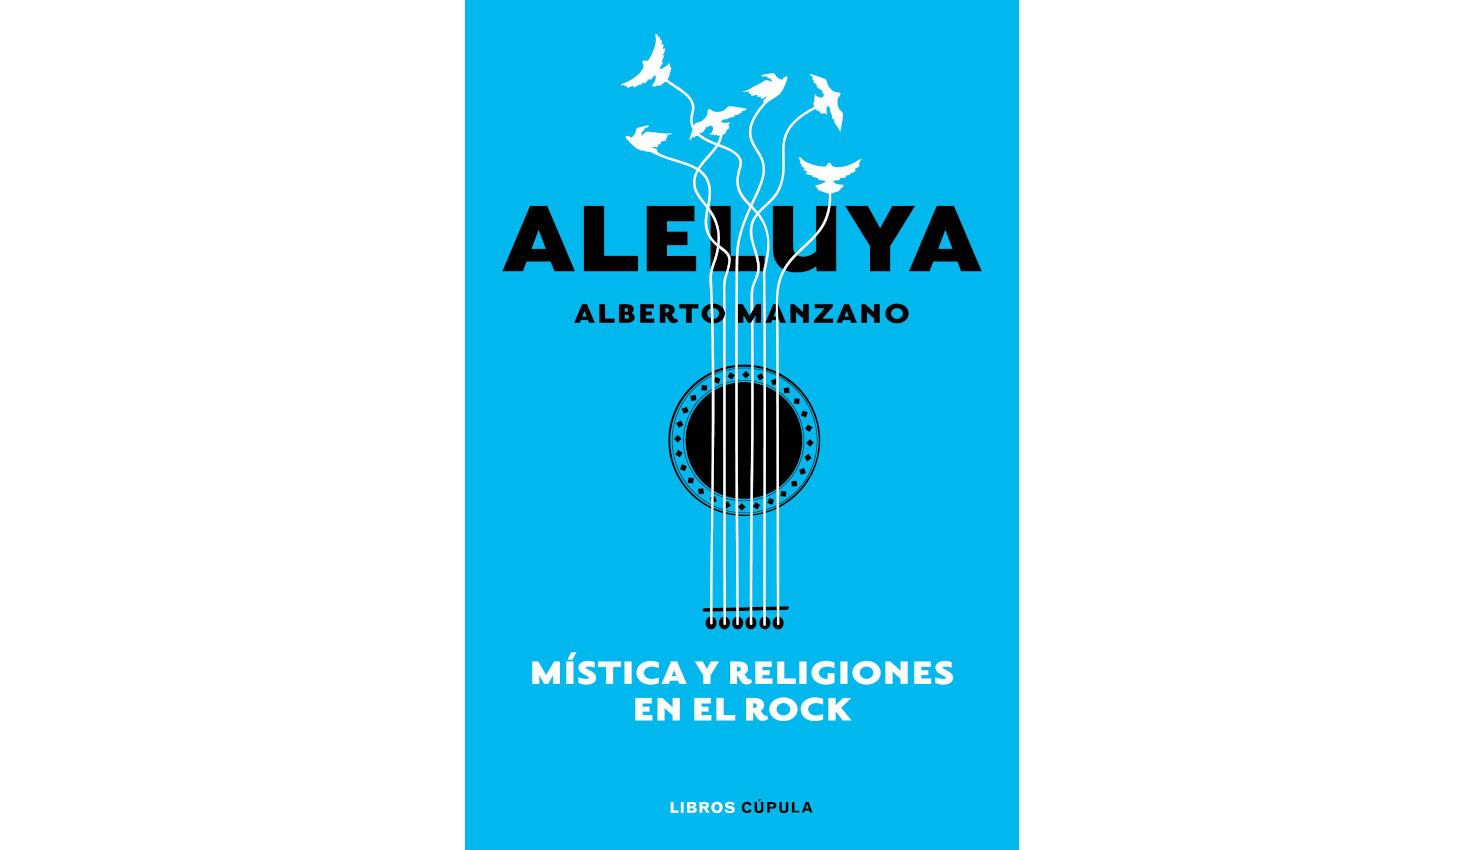 aleluya-albertomanzano-magazinehorse